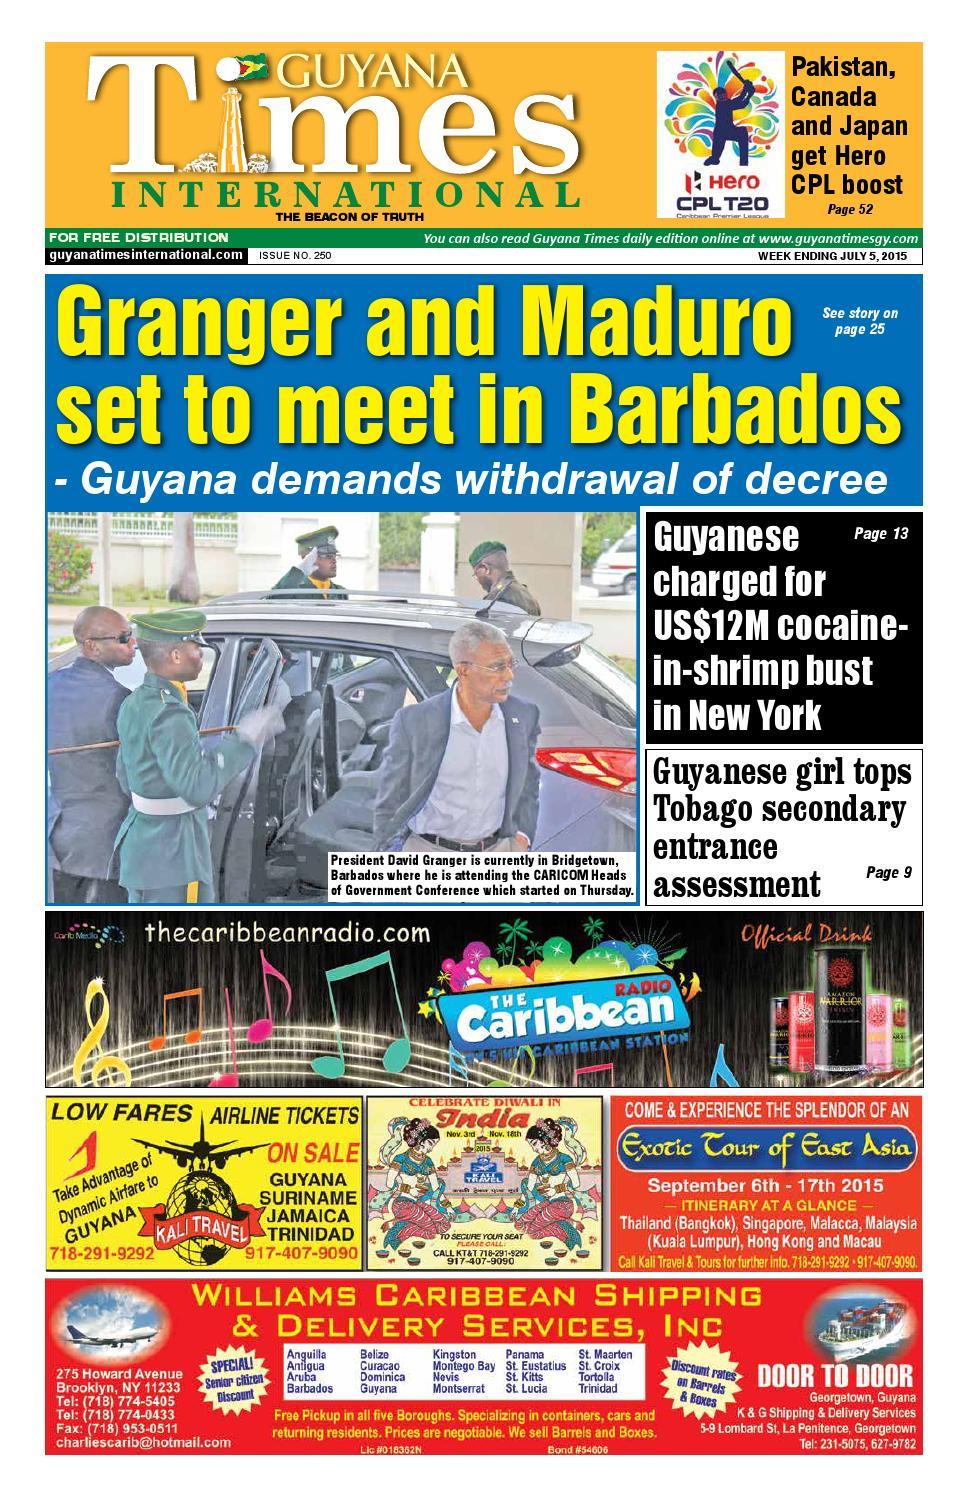 39ba06a8721a Guyana Times International by Gytimes - issuu